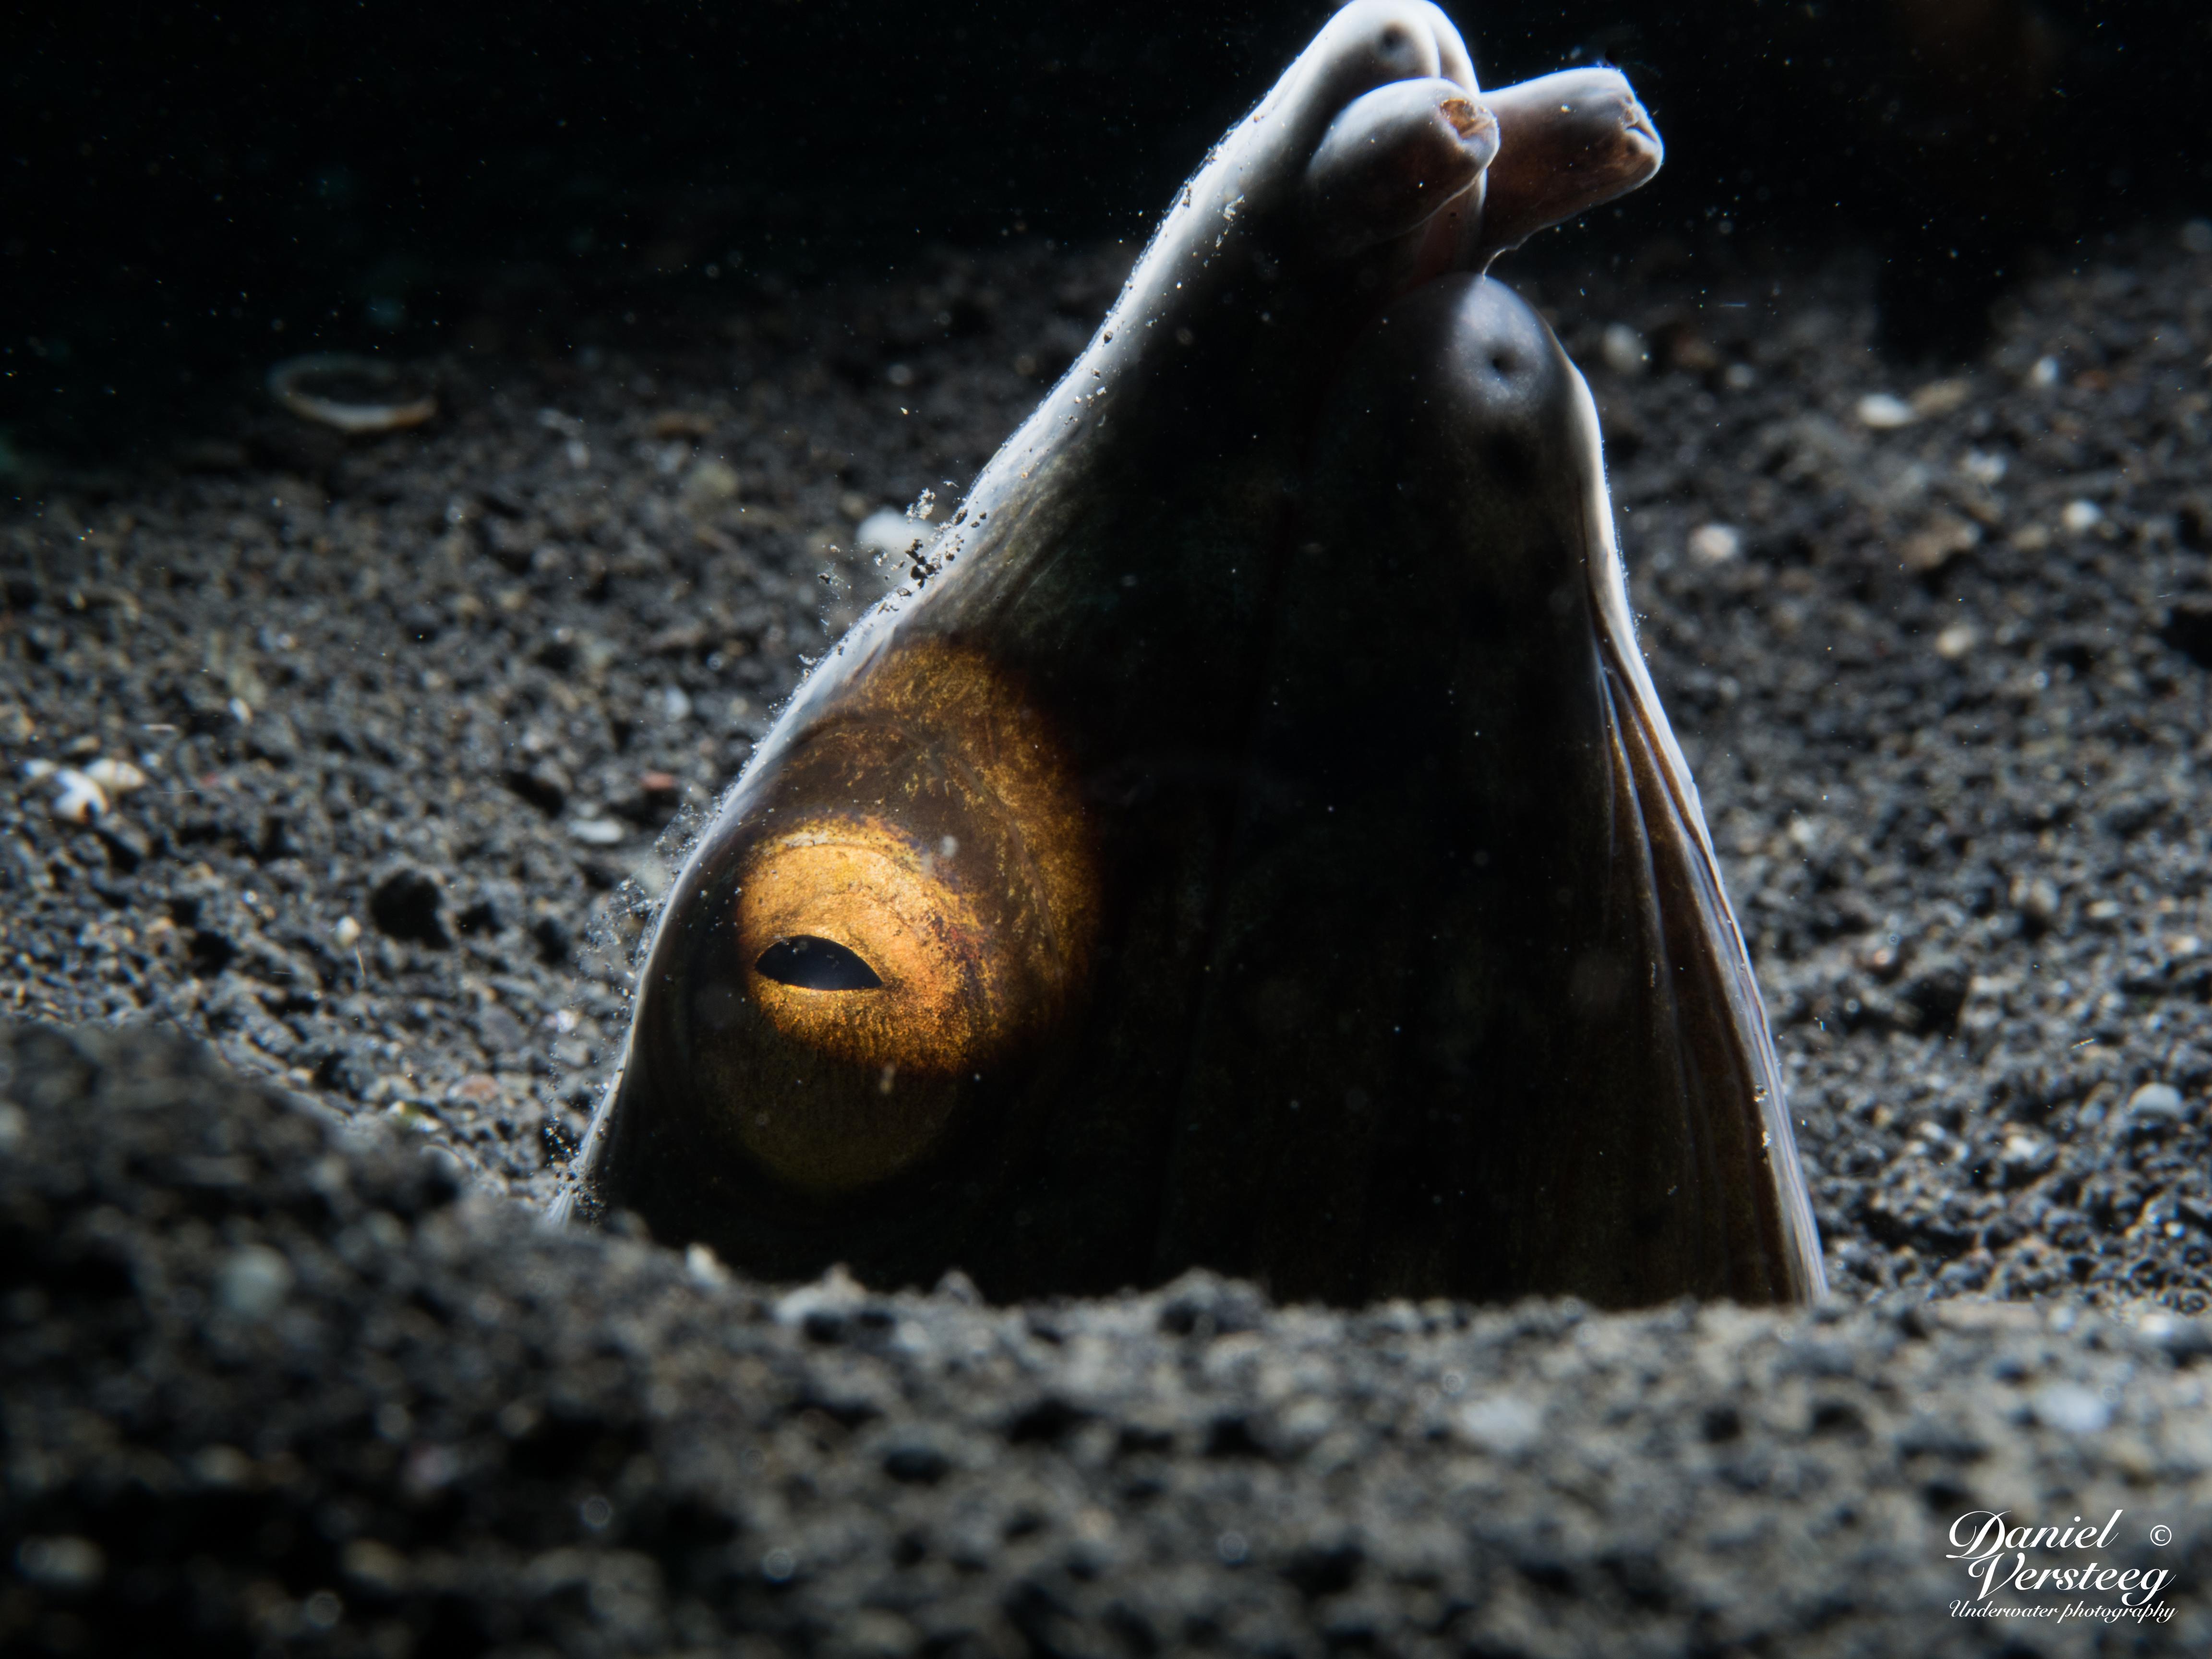 Daniel_Versteeg_foto-5-snake-eel-met-lsd-snoot-2